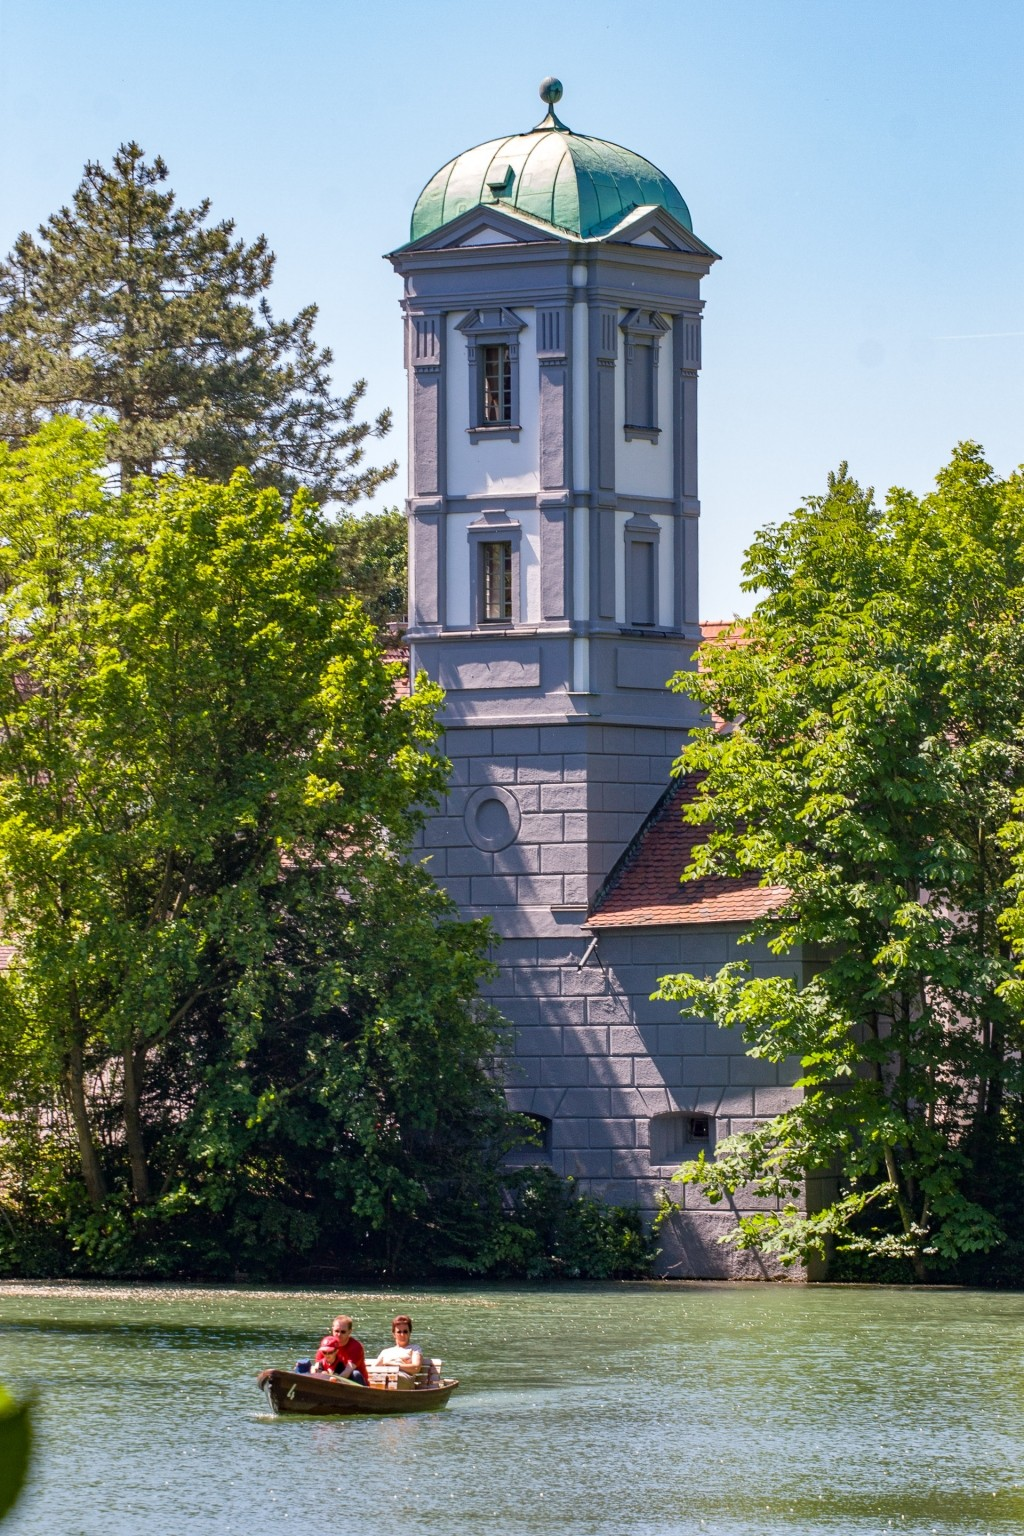 Wasserturm an der Kahnfahrt